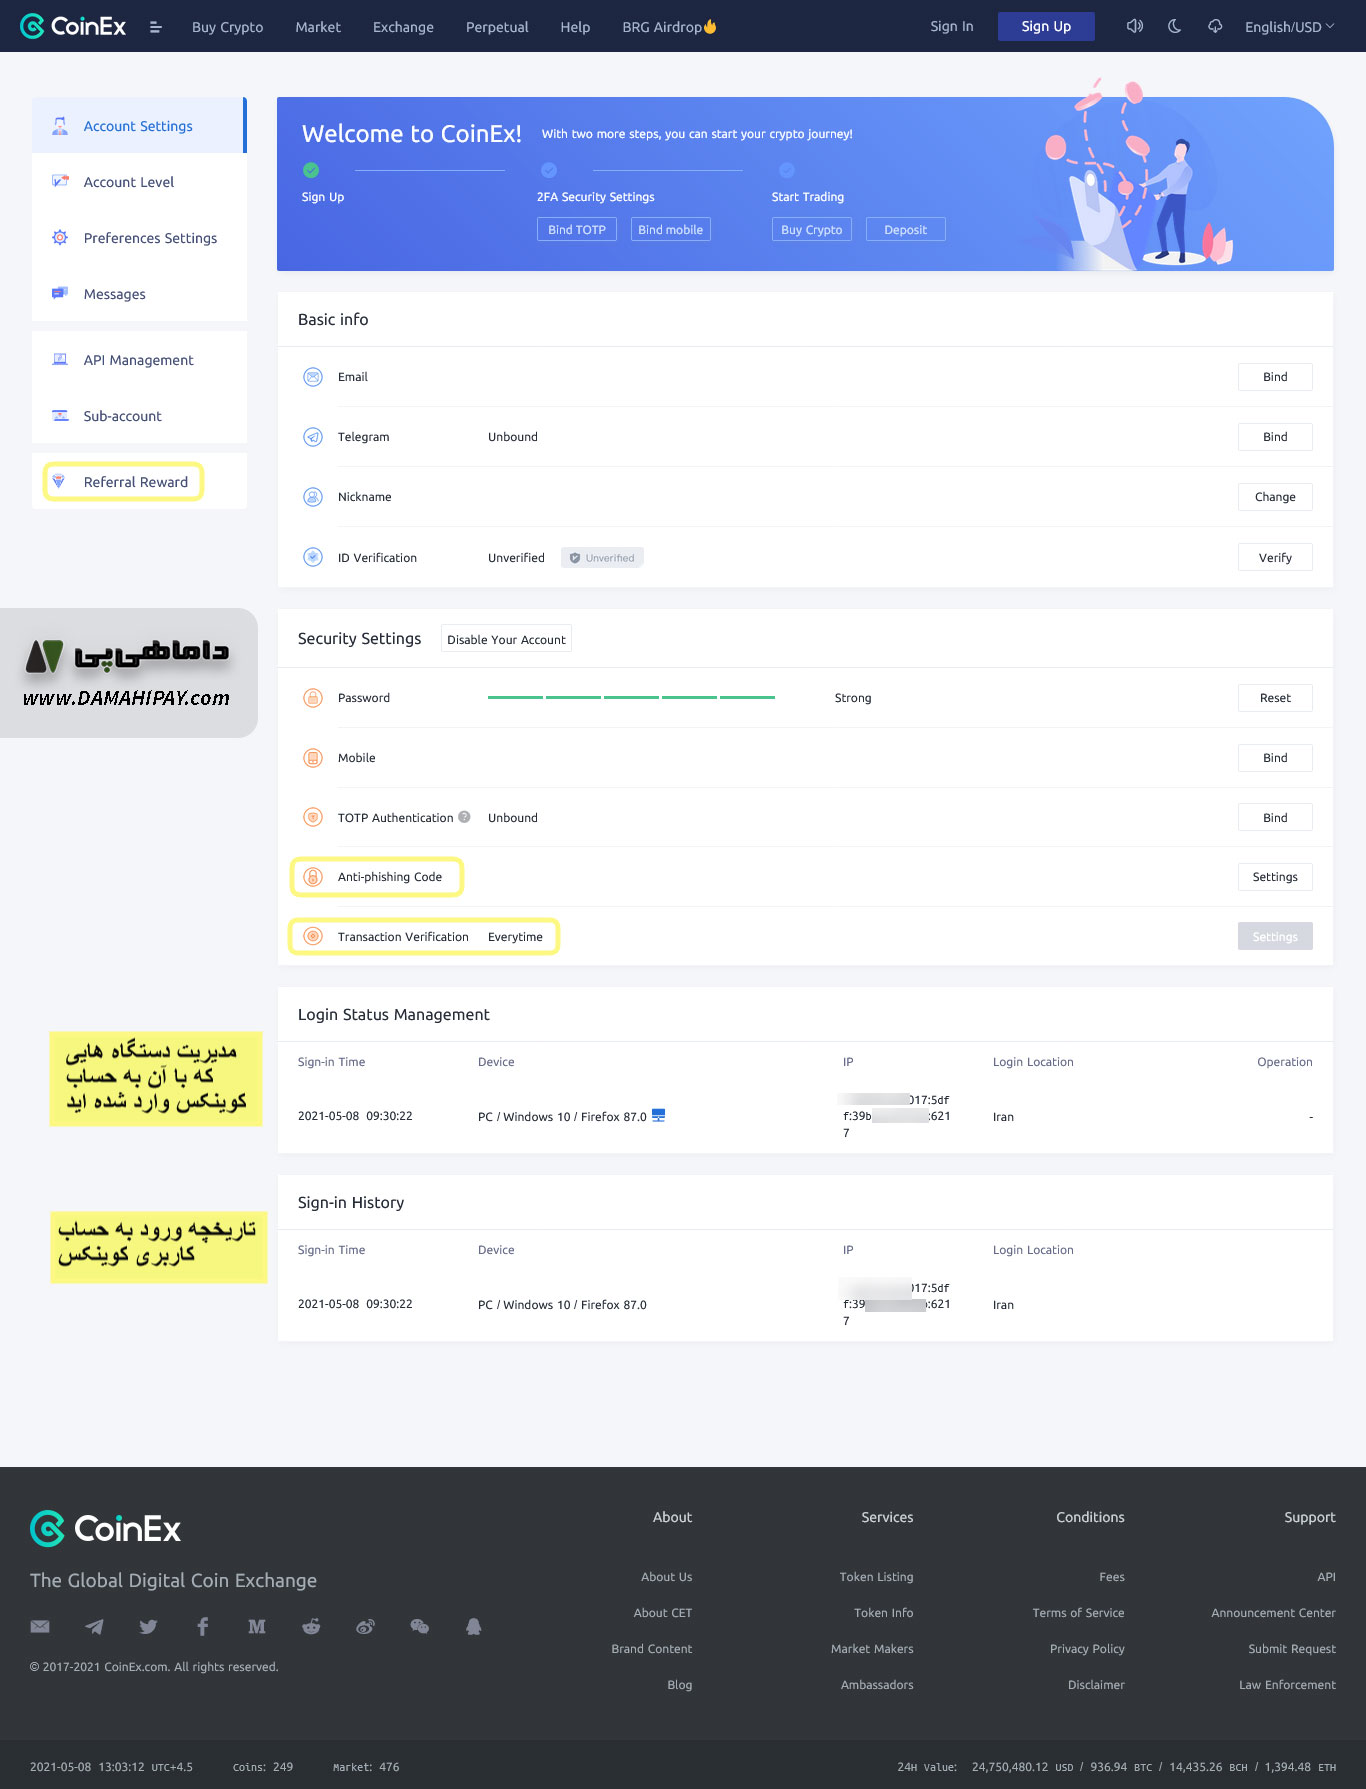 اطلاعات حساب کوینکس -اتمام افتتاح حساب